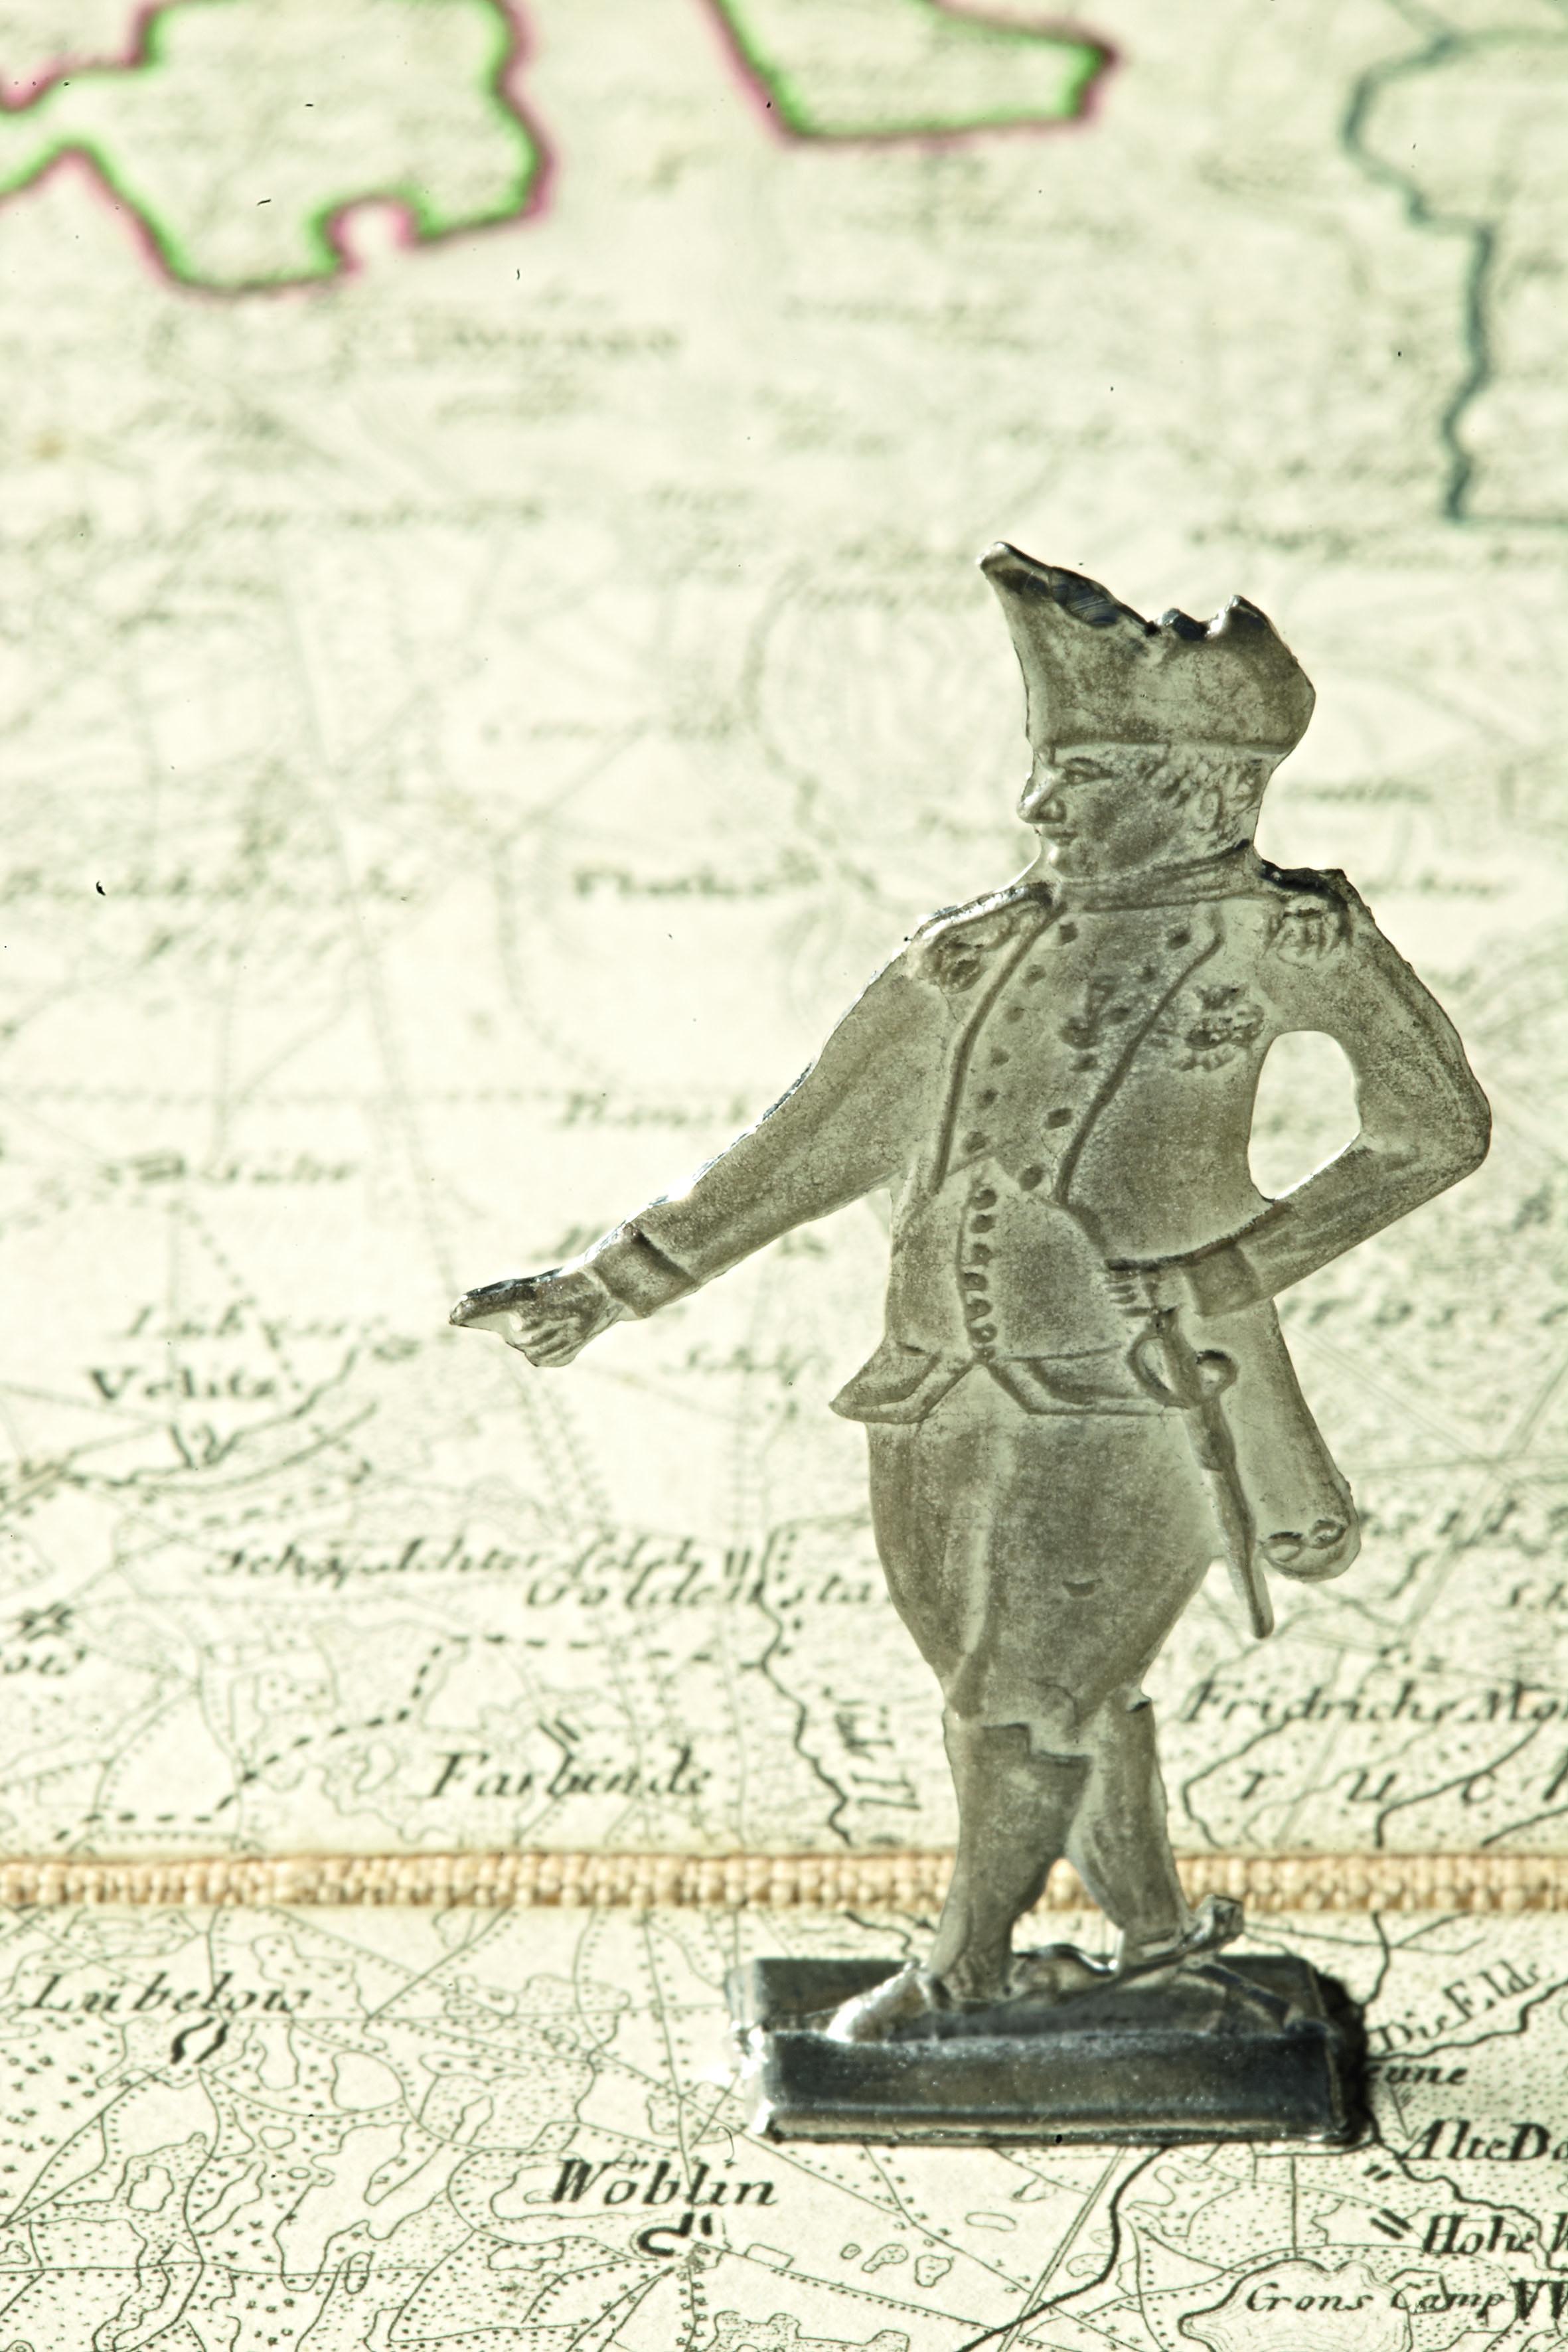 Die Fabelhafte Welt der Zinnfiguren © Freilichtmuseum Schwerin-Muess